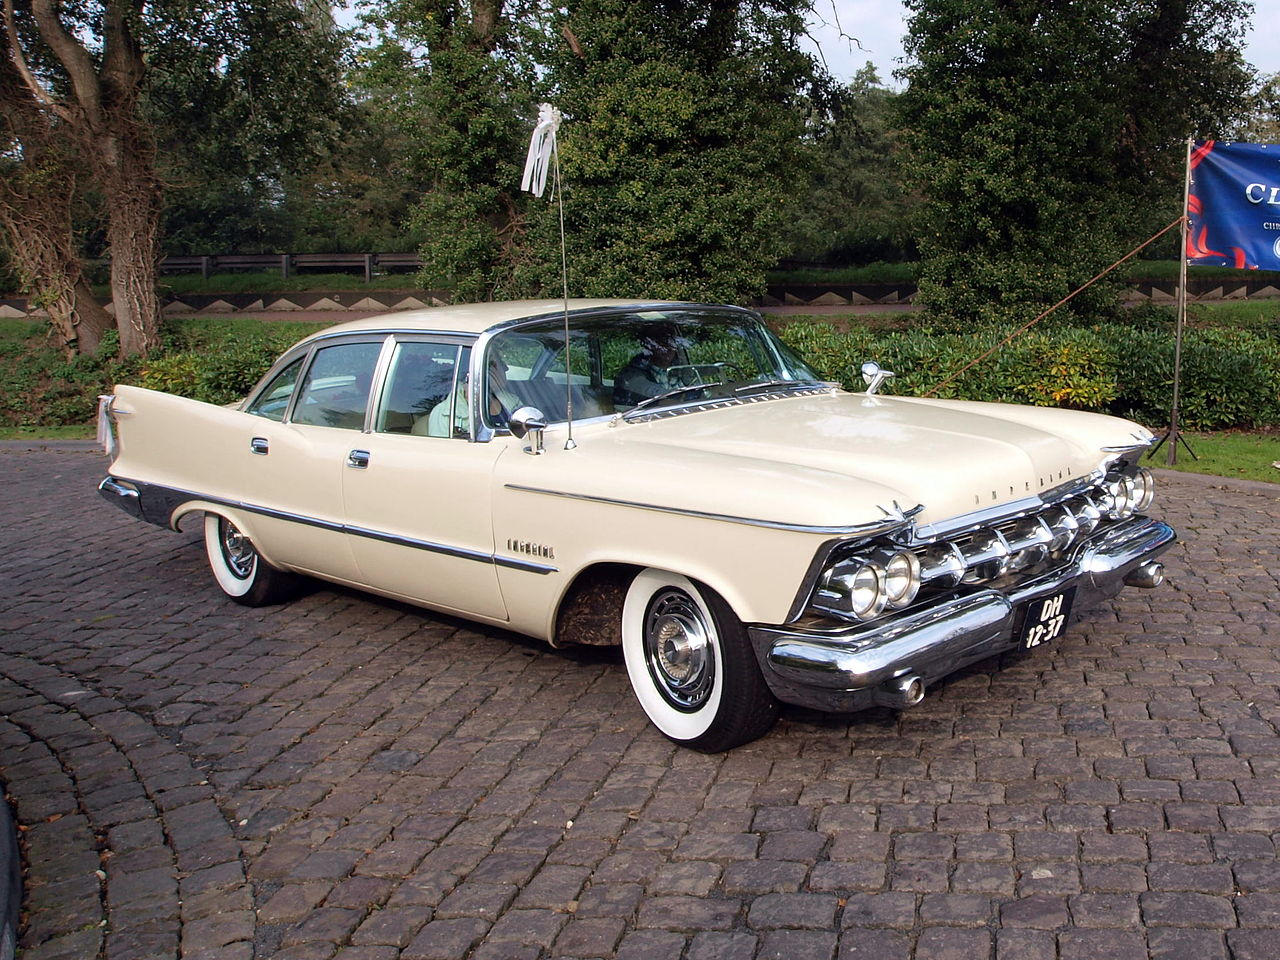 1958 Imperial Wiring Diagram Trusted Diagrams 56 Mercury Montclair 1959 Chrysler Windsor Portal U2022 1969